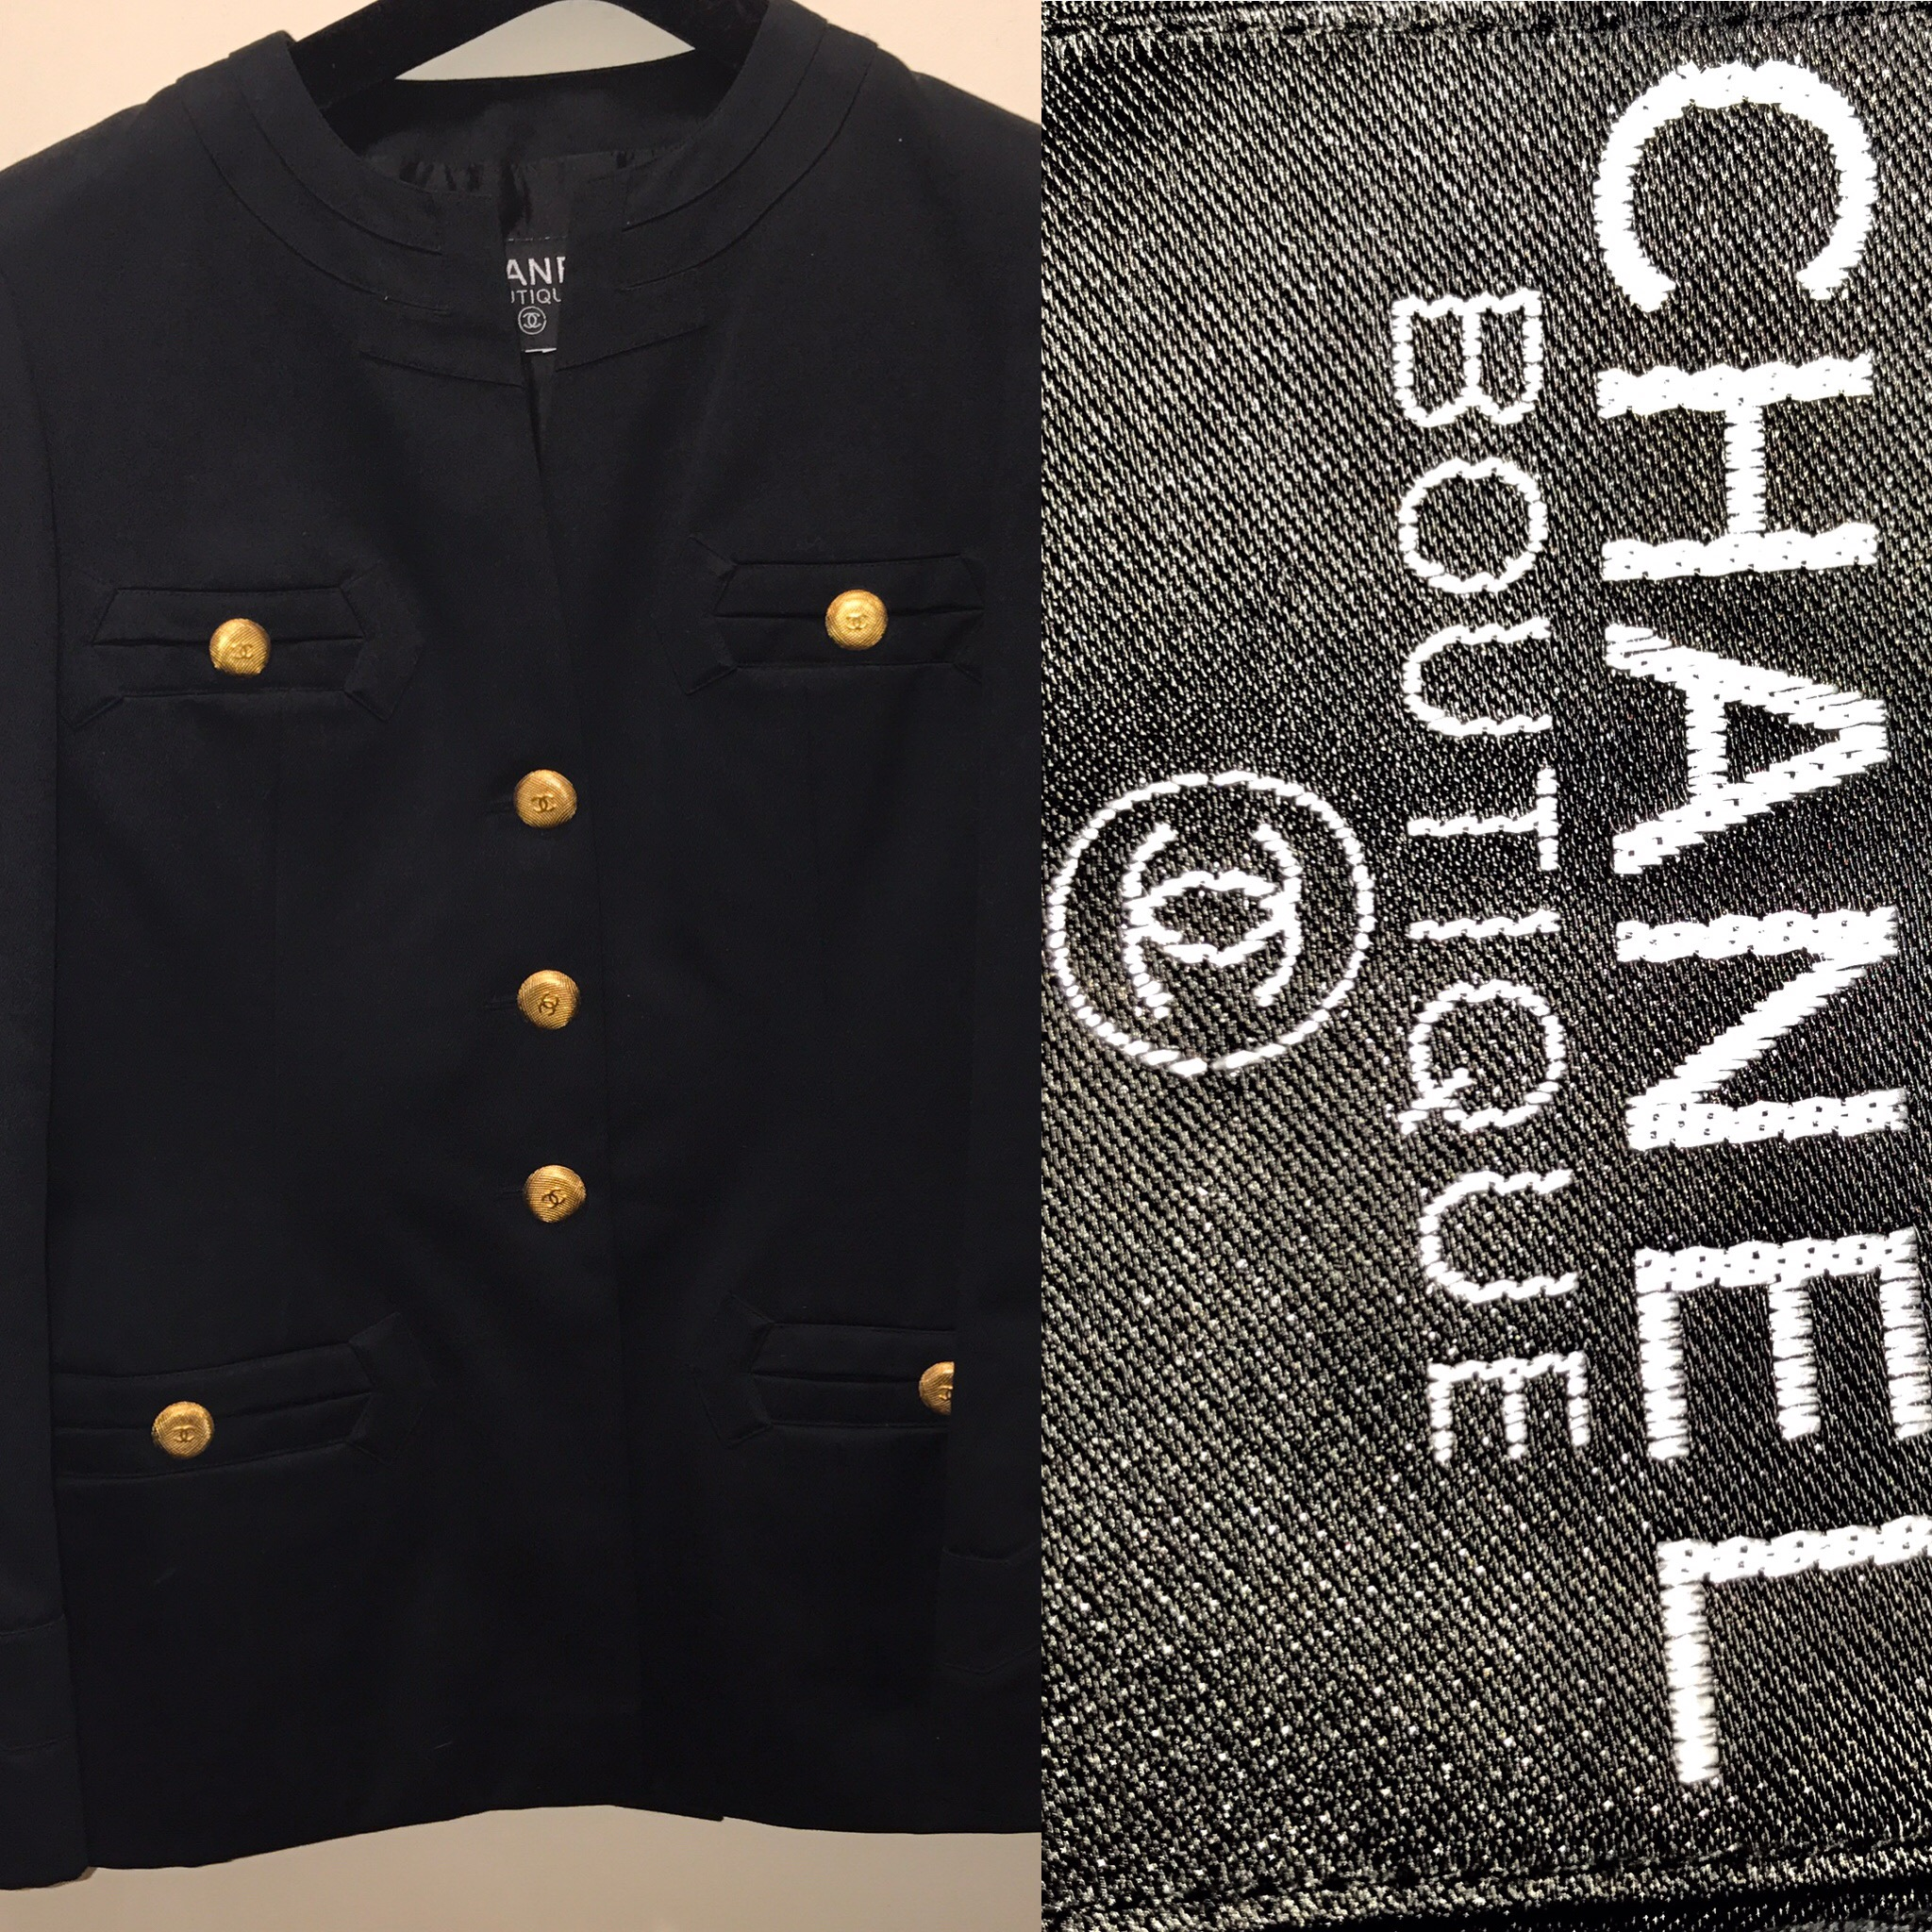 Chanel jacket navy blue £499 (1).JPG